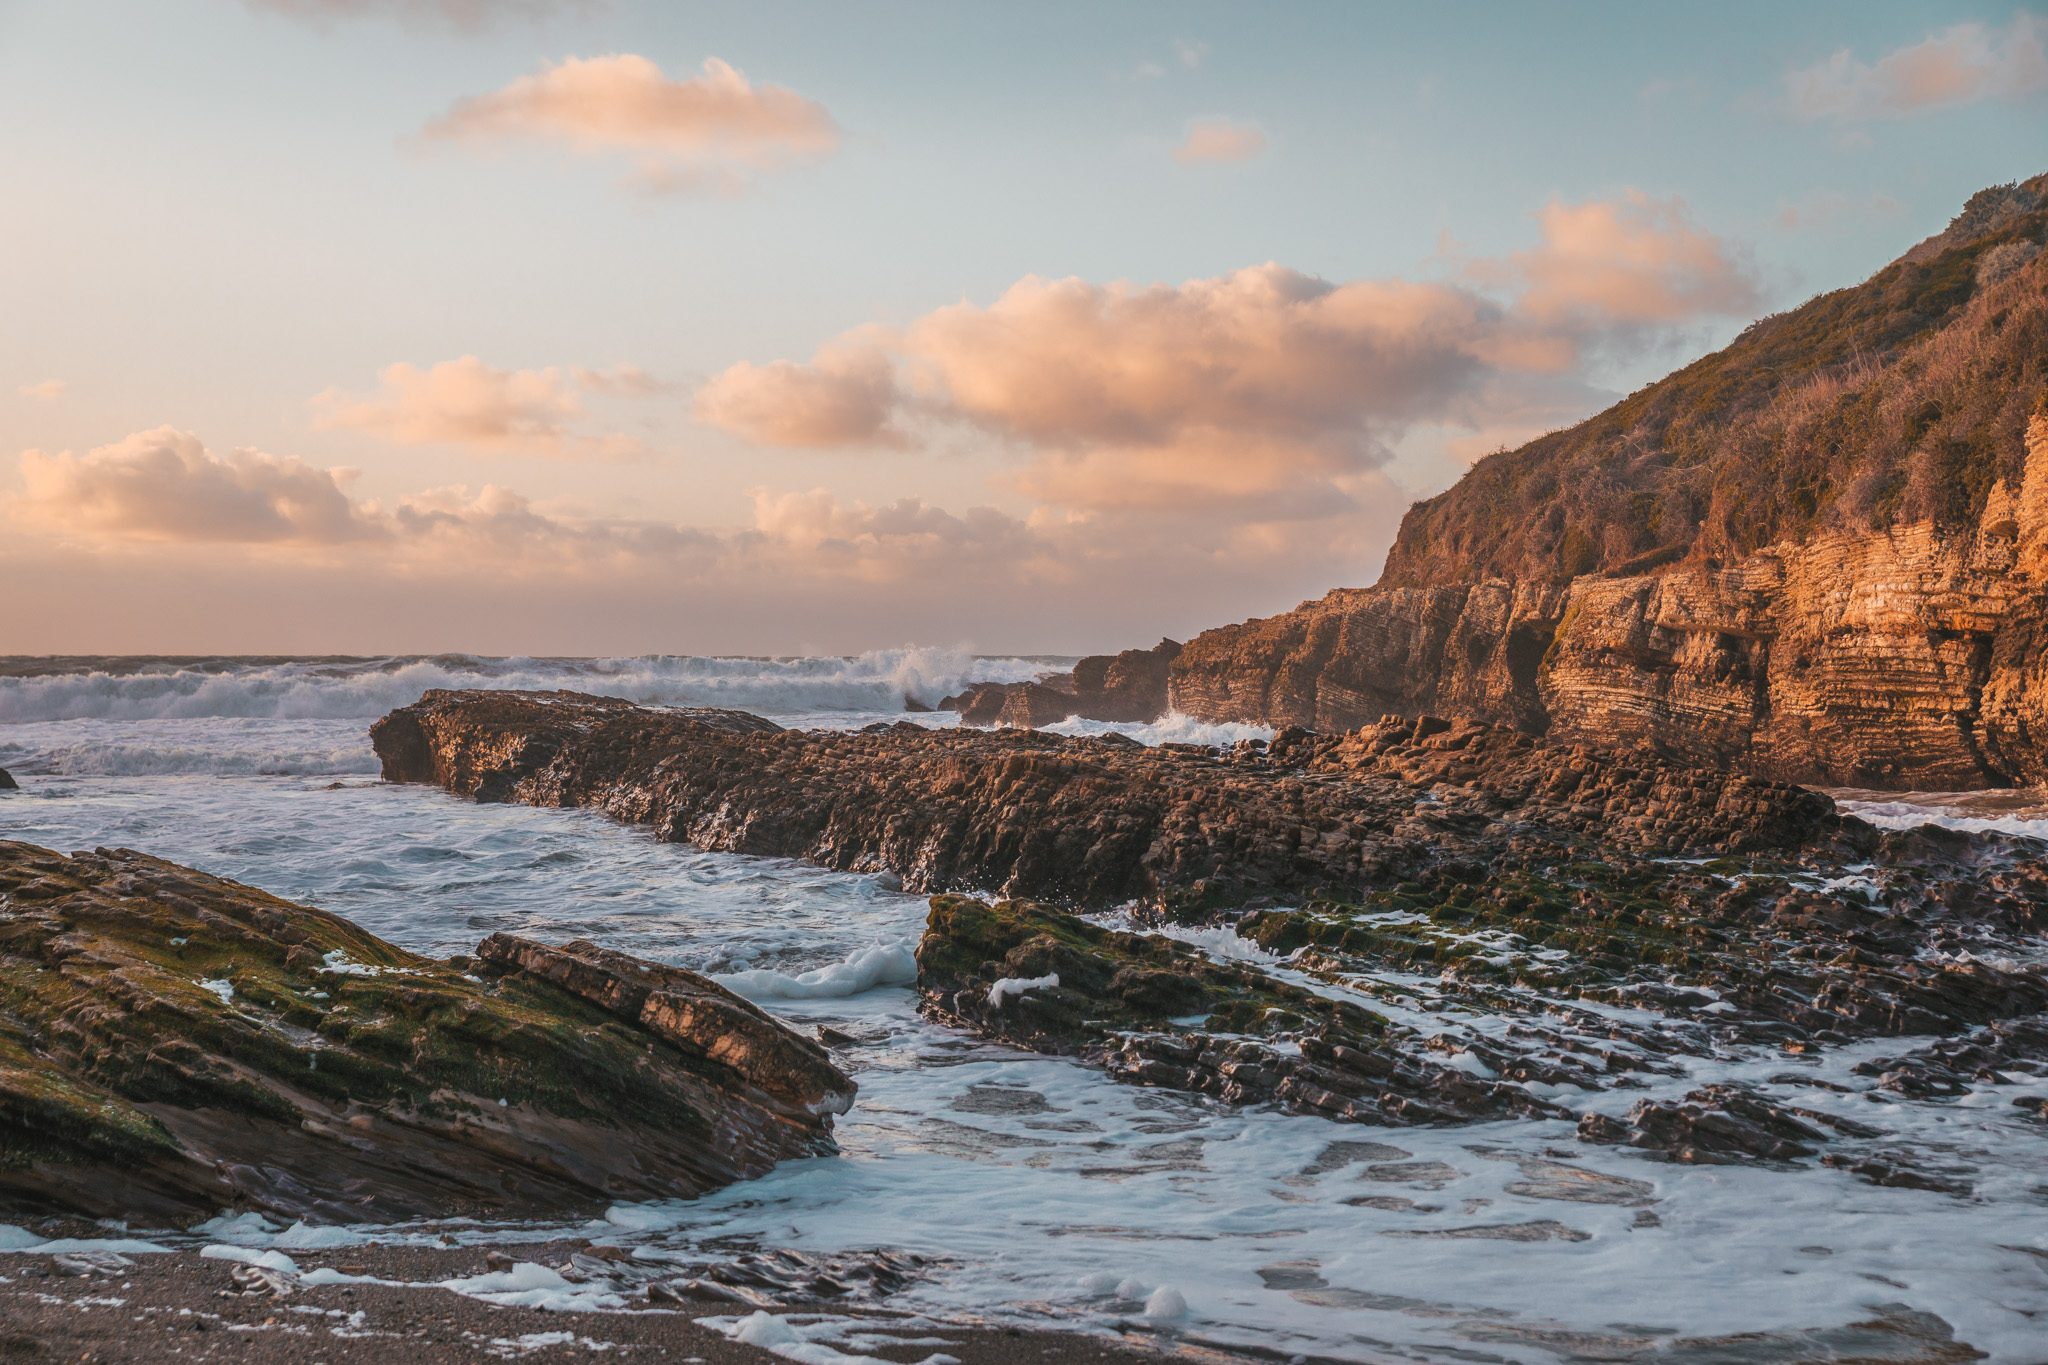 Spooner's Cove ~ The Most Instagrammable Spots in SLO CAL County ~ #readysetjetset #slocal #california #blogpost #travel #sanluisobispo